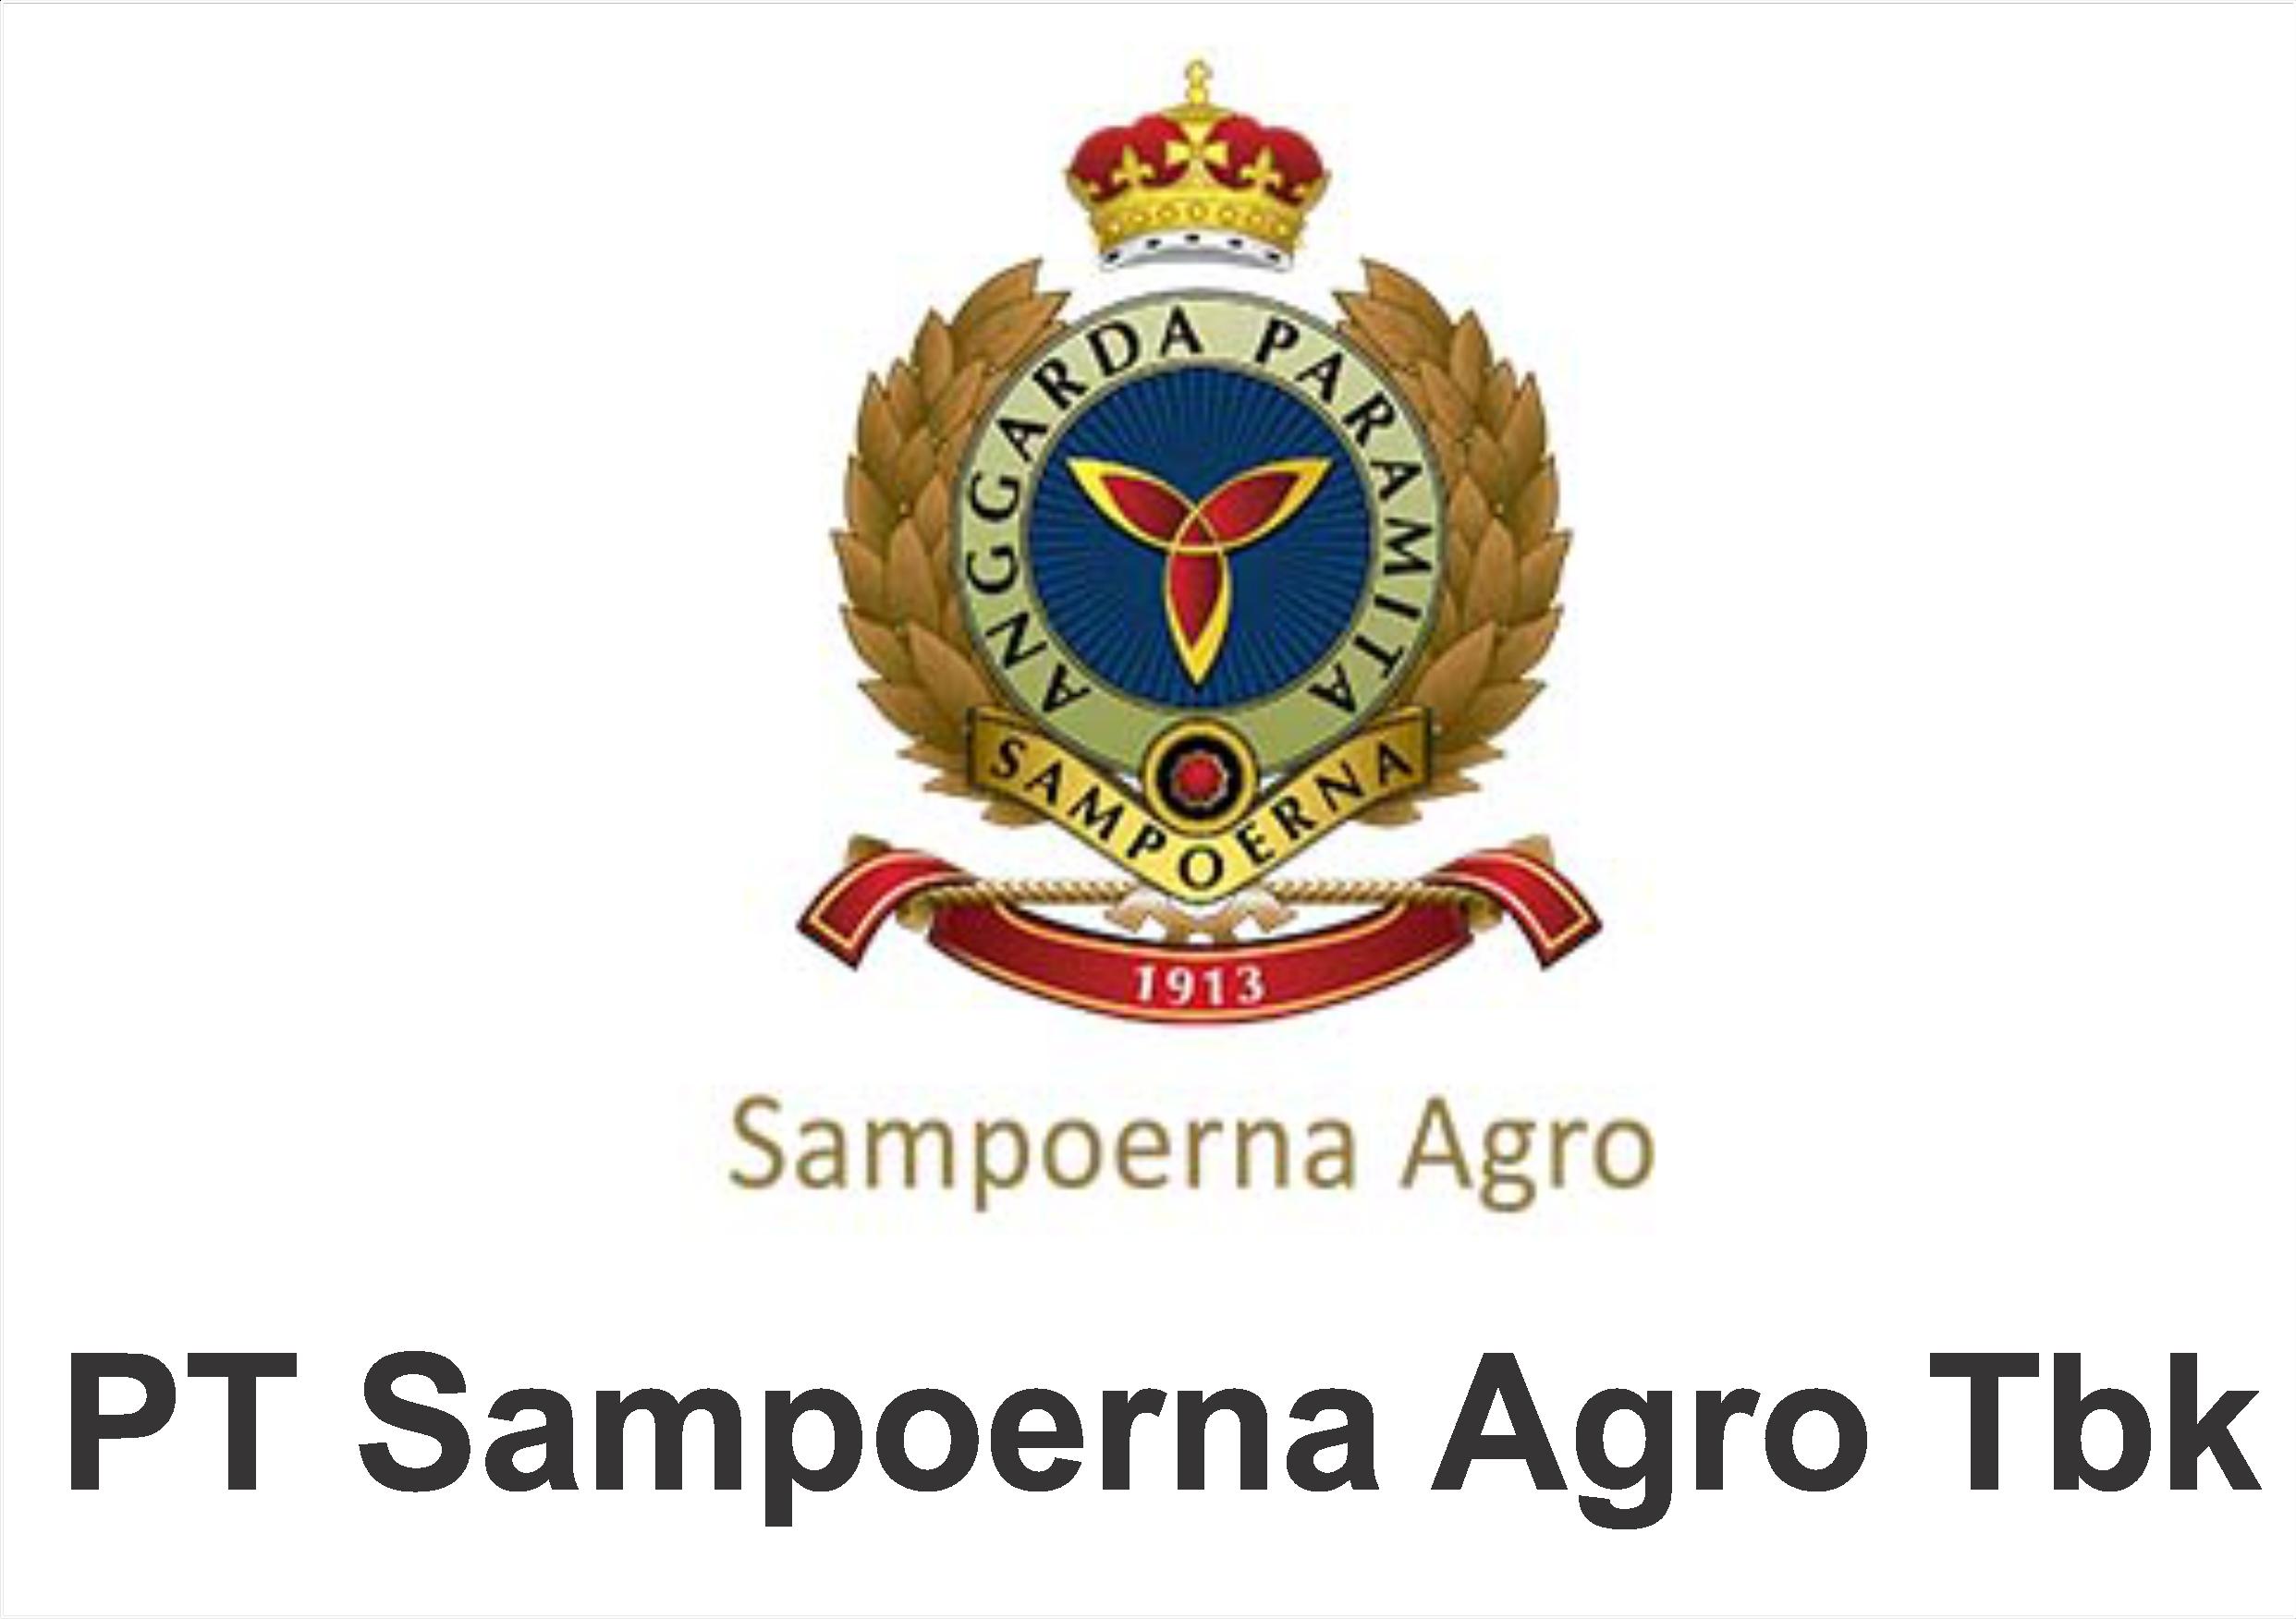 PT Sampoerna Agro Tbk